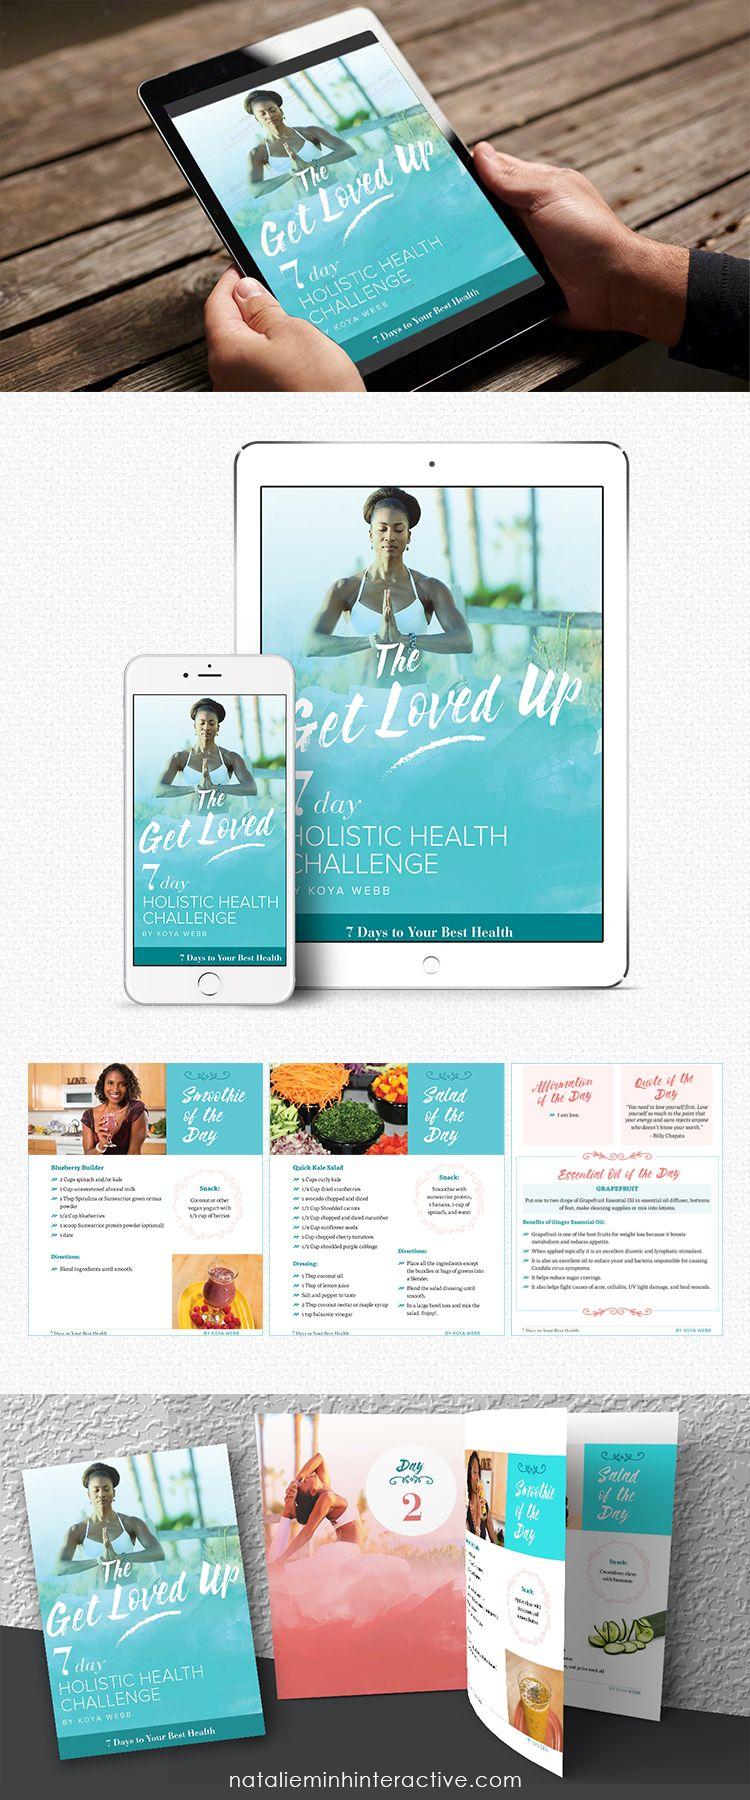 Koya Webb 7 DAYS HOLISTIC HEALTH CHALLENGE Ebook Design by